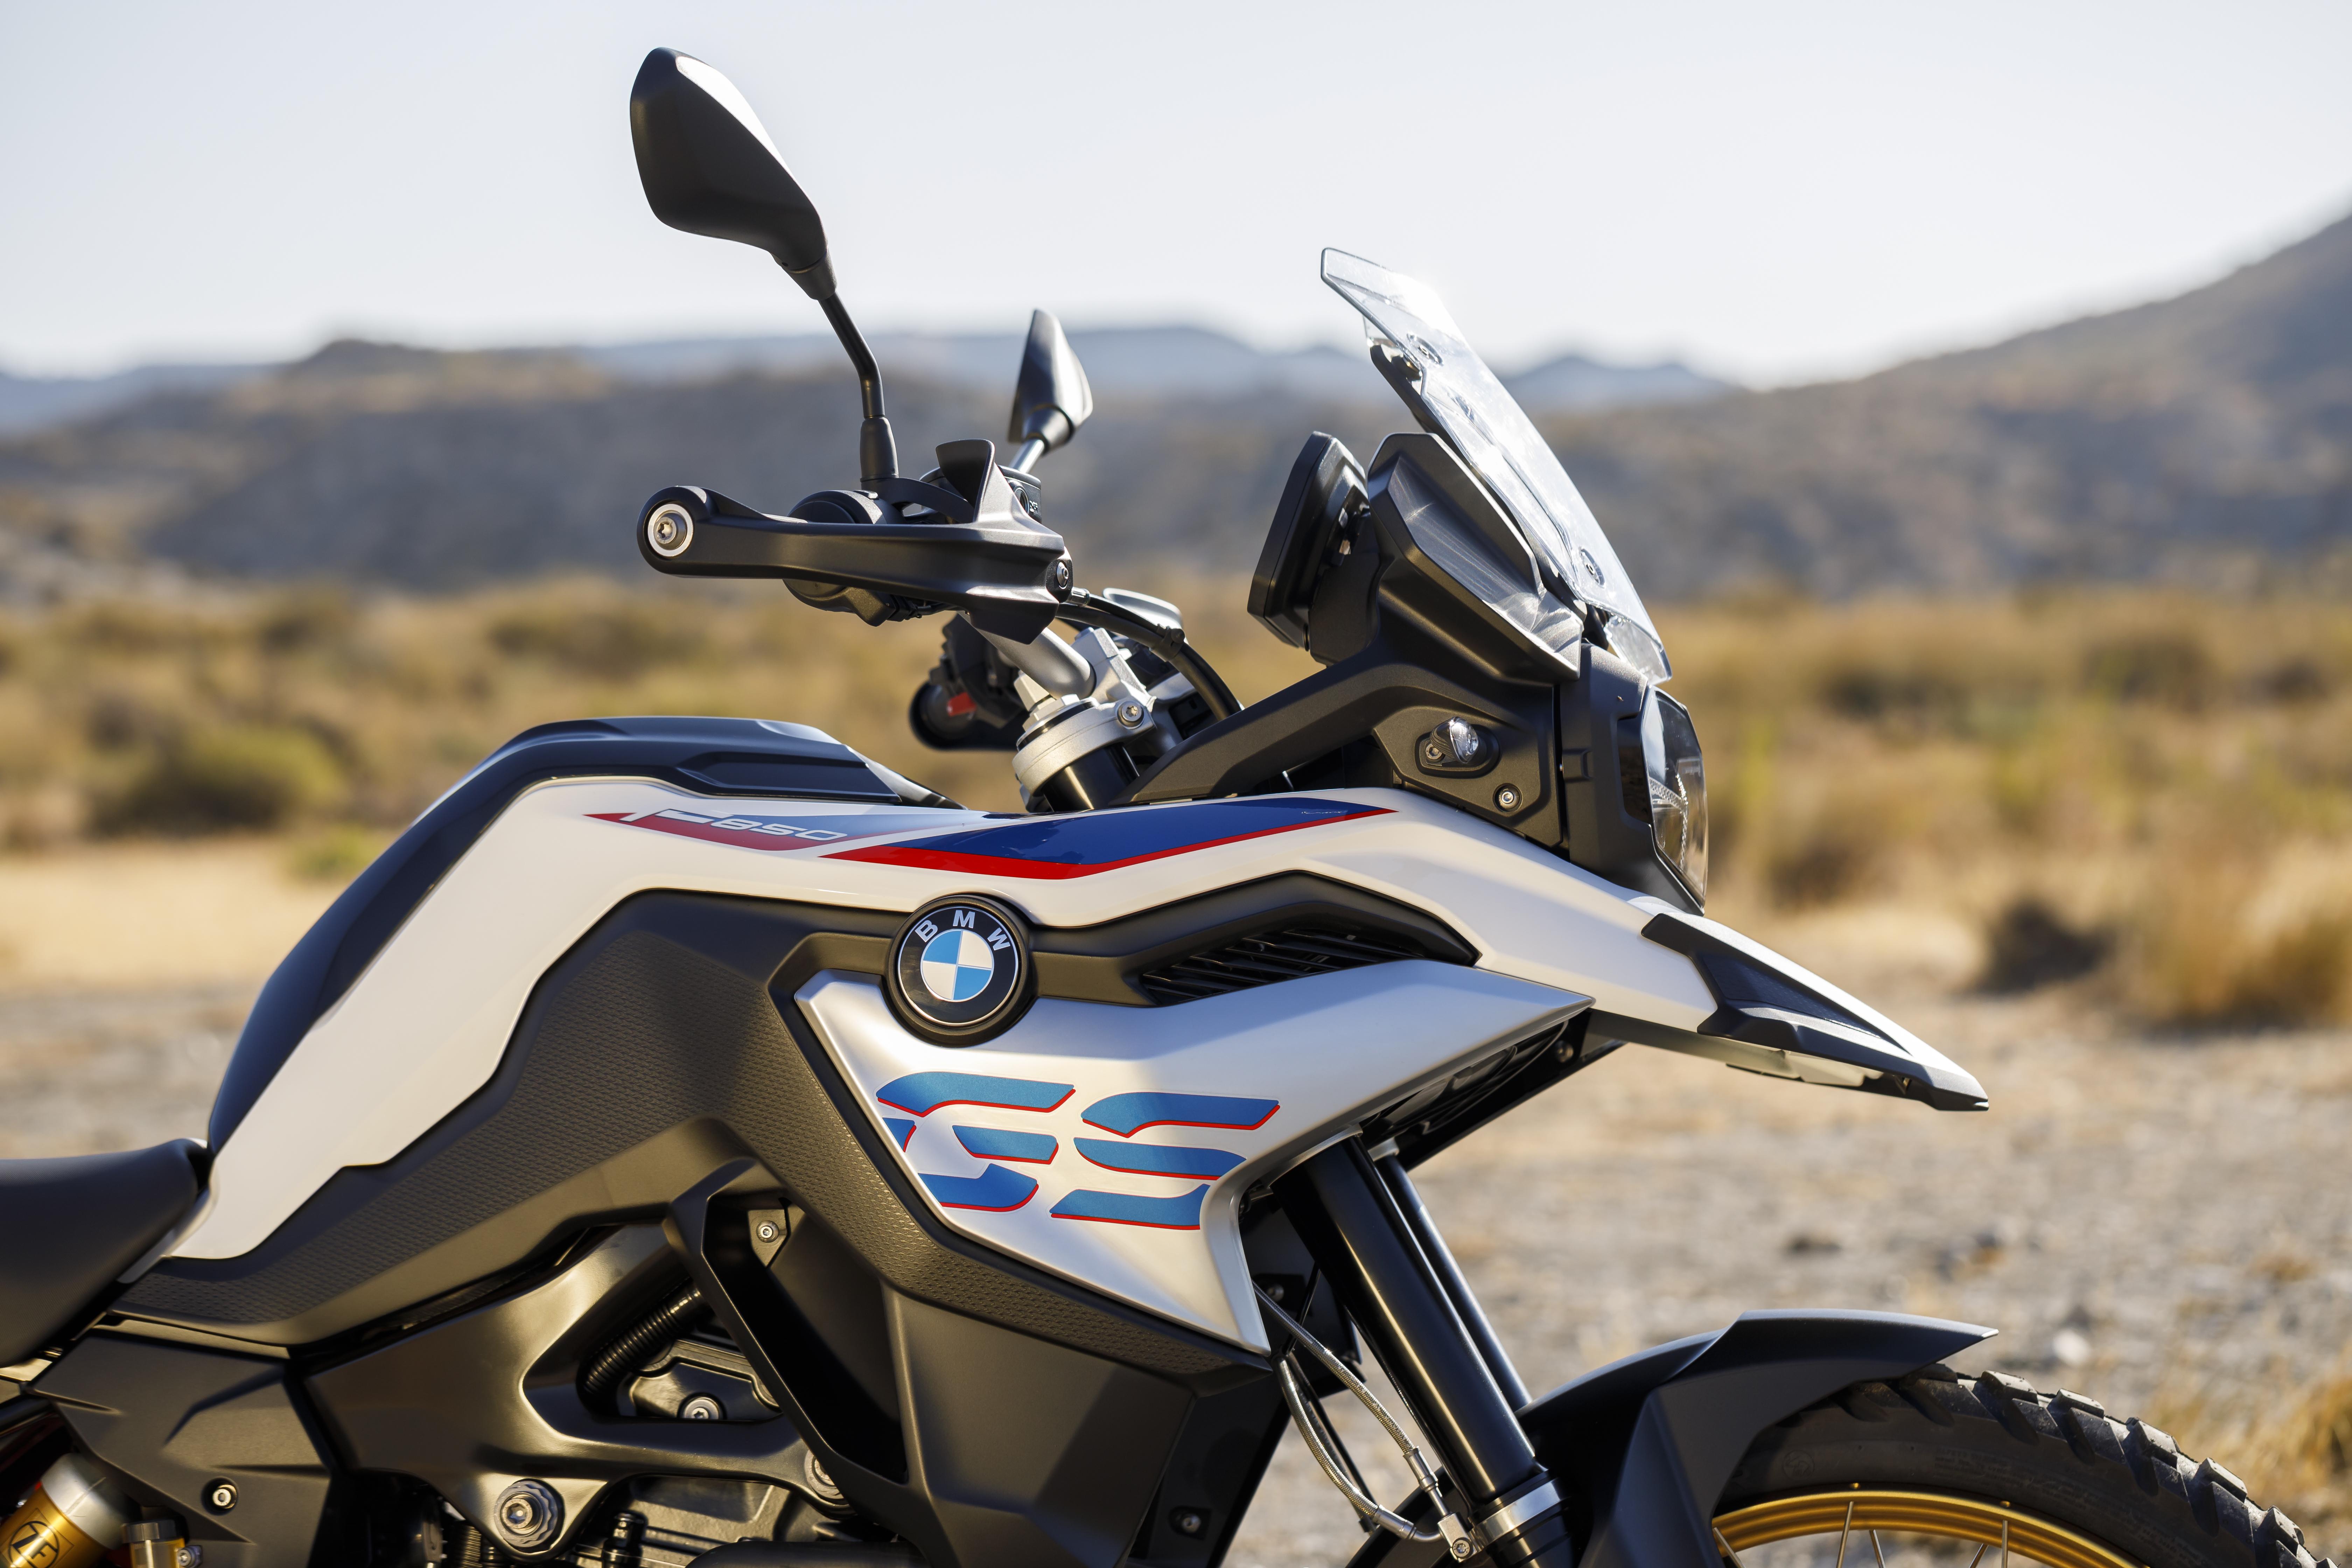 Prueba BMW 850 GS 2018 presentación MotorADN fotos prensa (75)